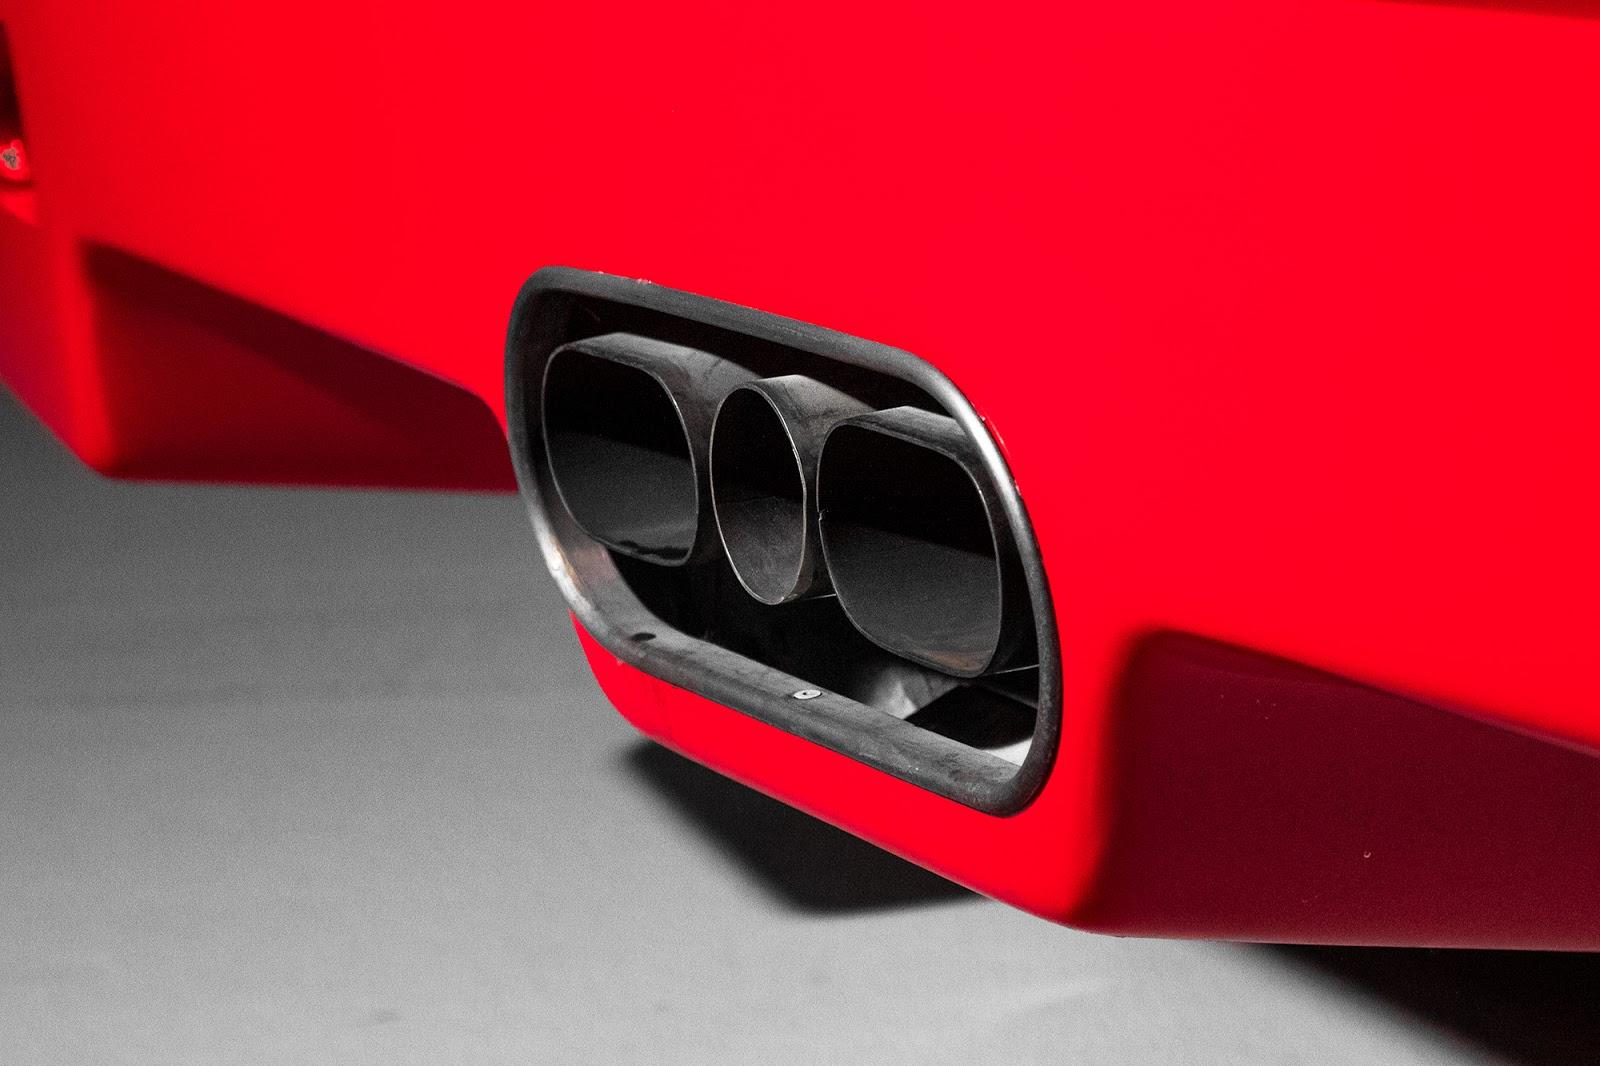 MK5 5080 F40. O μύθος, ο θρύλος F40, Ferrari, Ferrari F40, retrocar, retrocar sunday, zblog